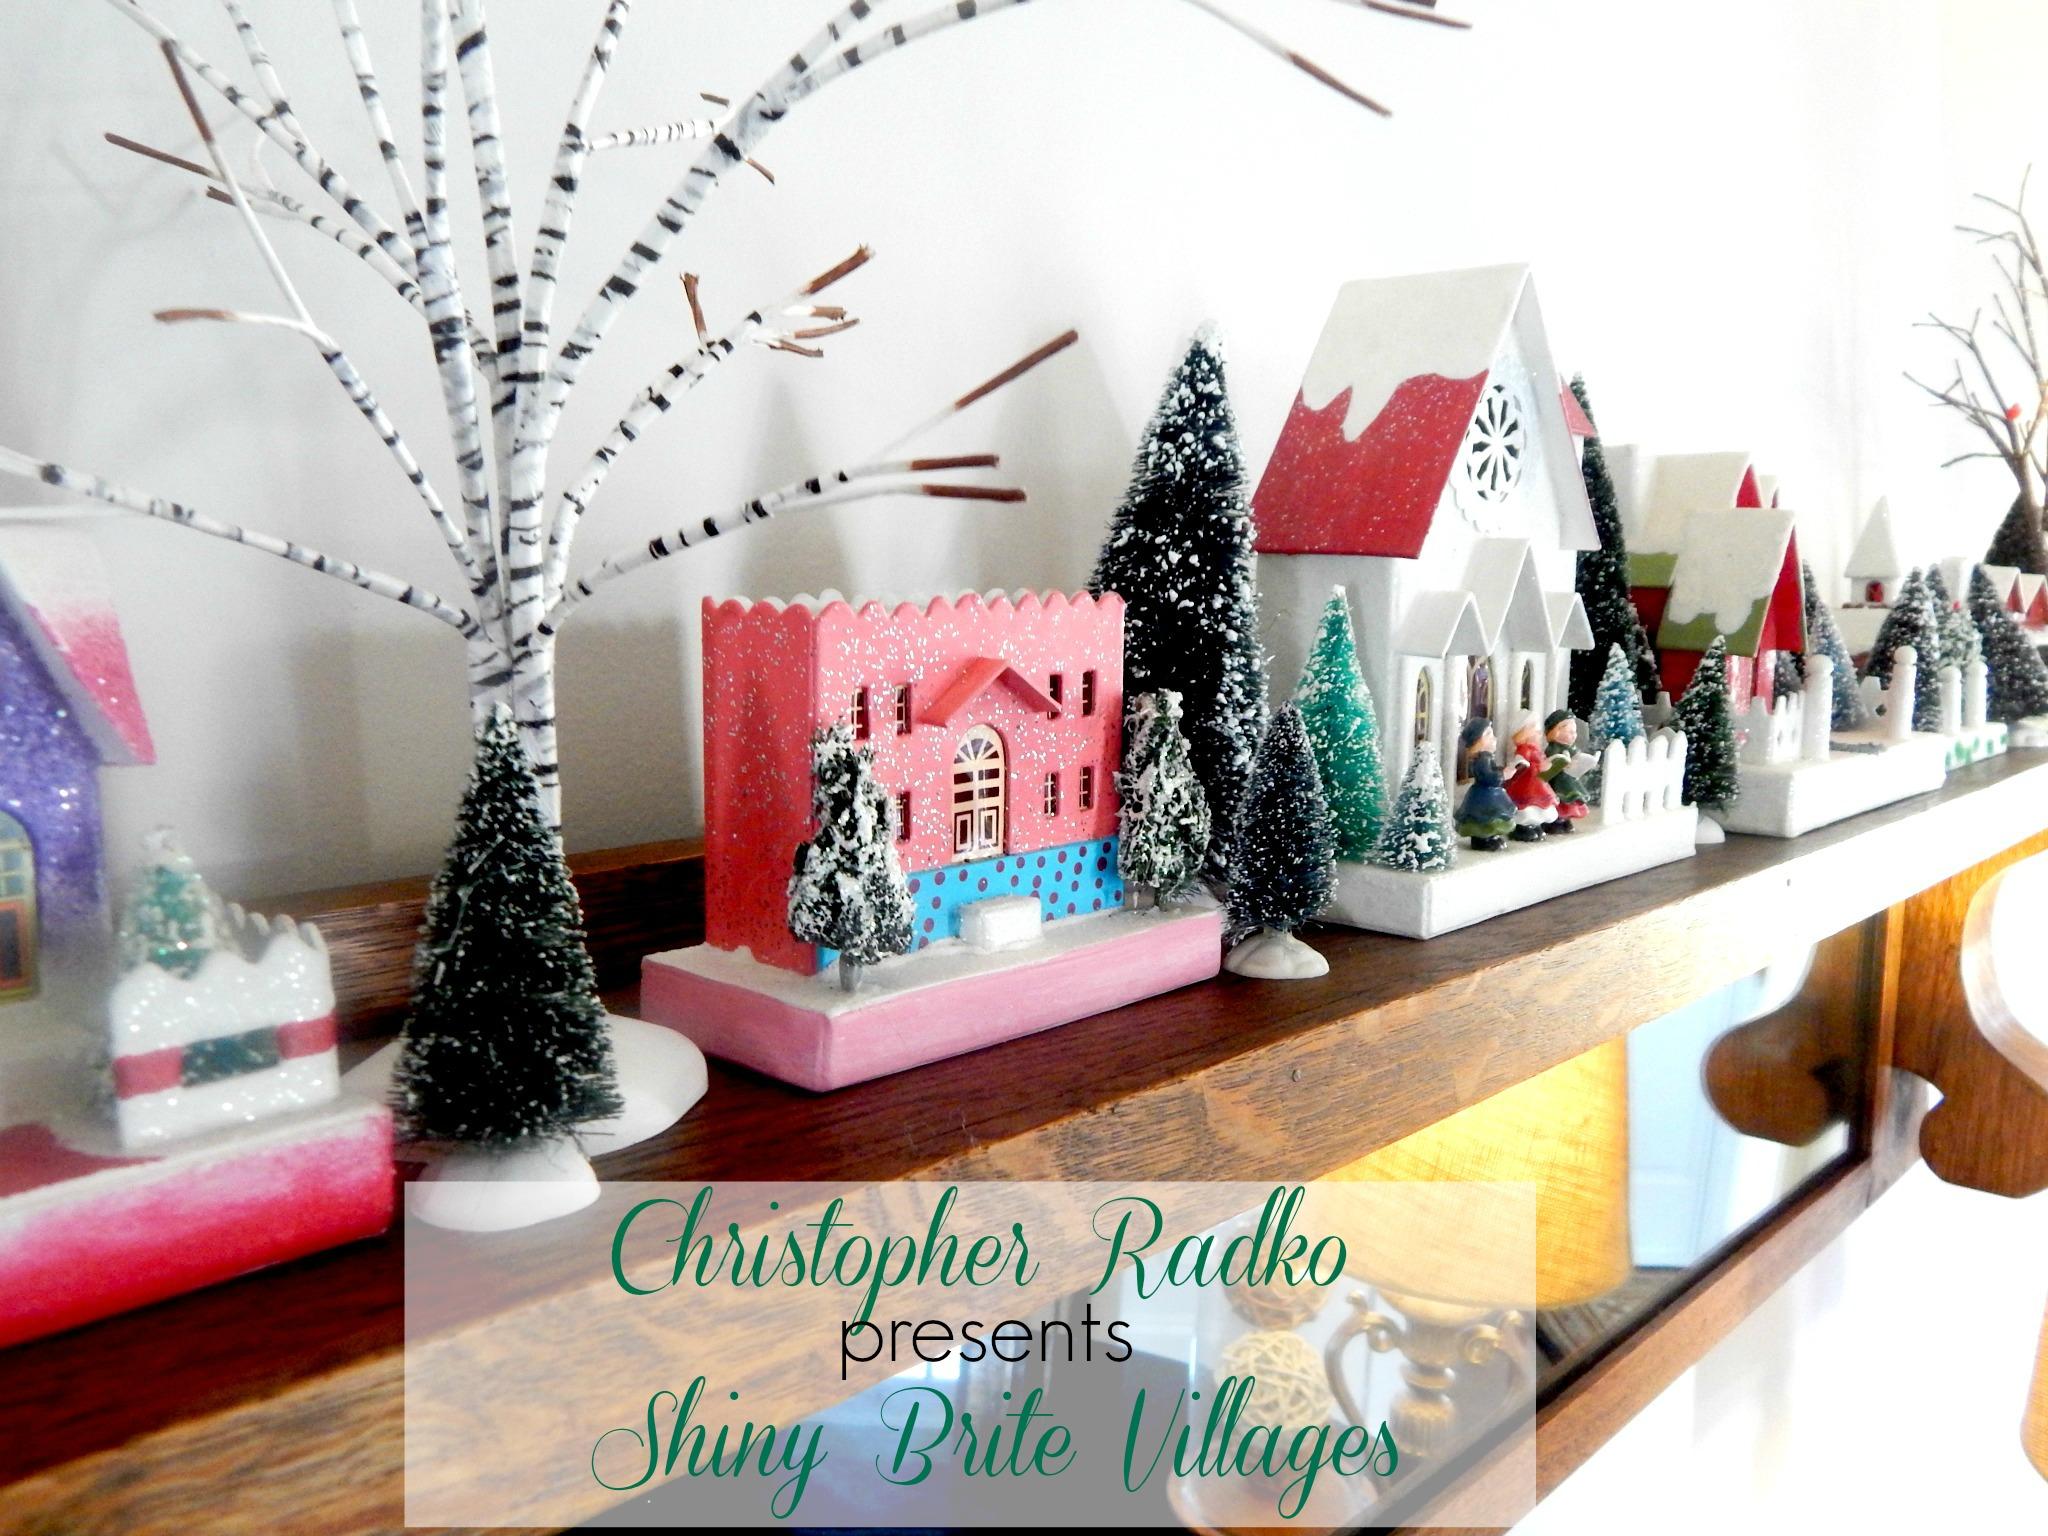 Christopher radko christmas tree uncategorized cute christmas tree